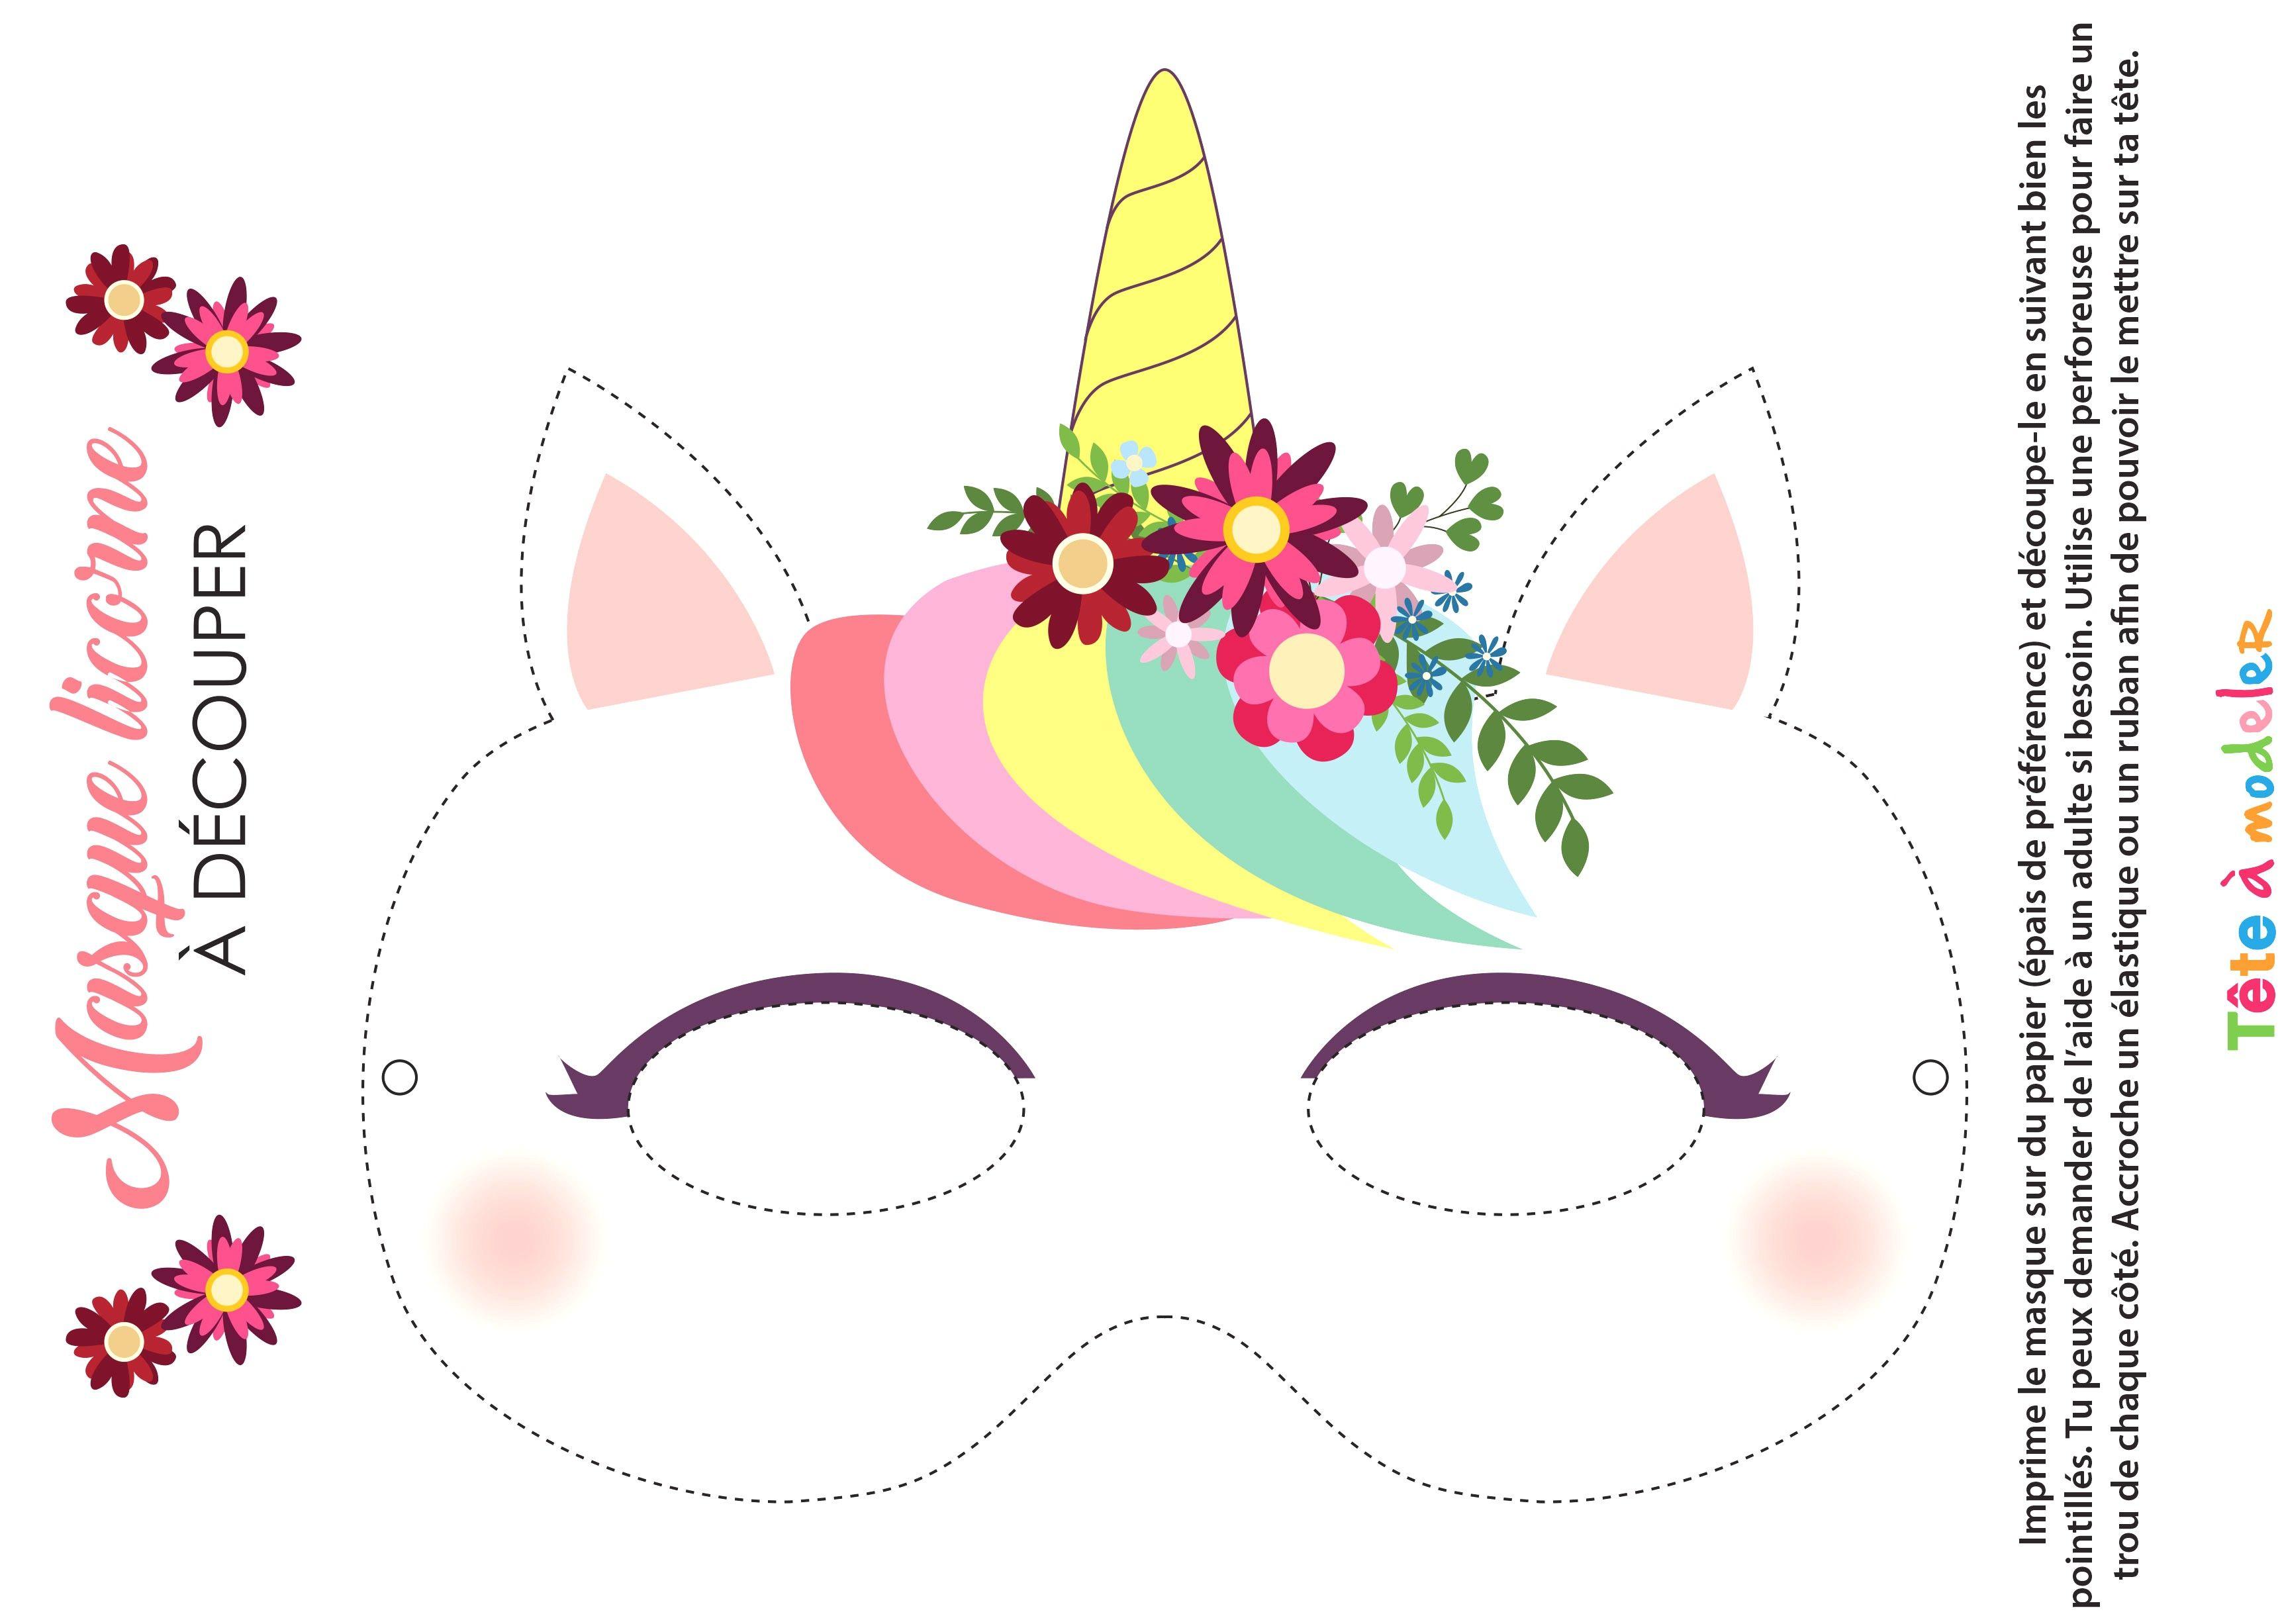 Masque De Licorne Imprimer Avec Masque De Licorne A Imprimer Et